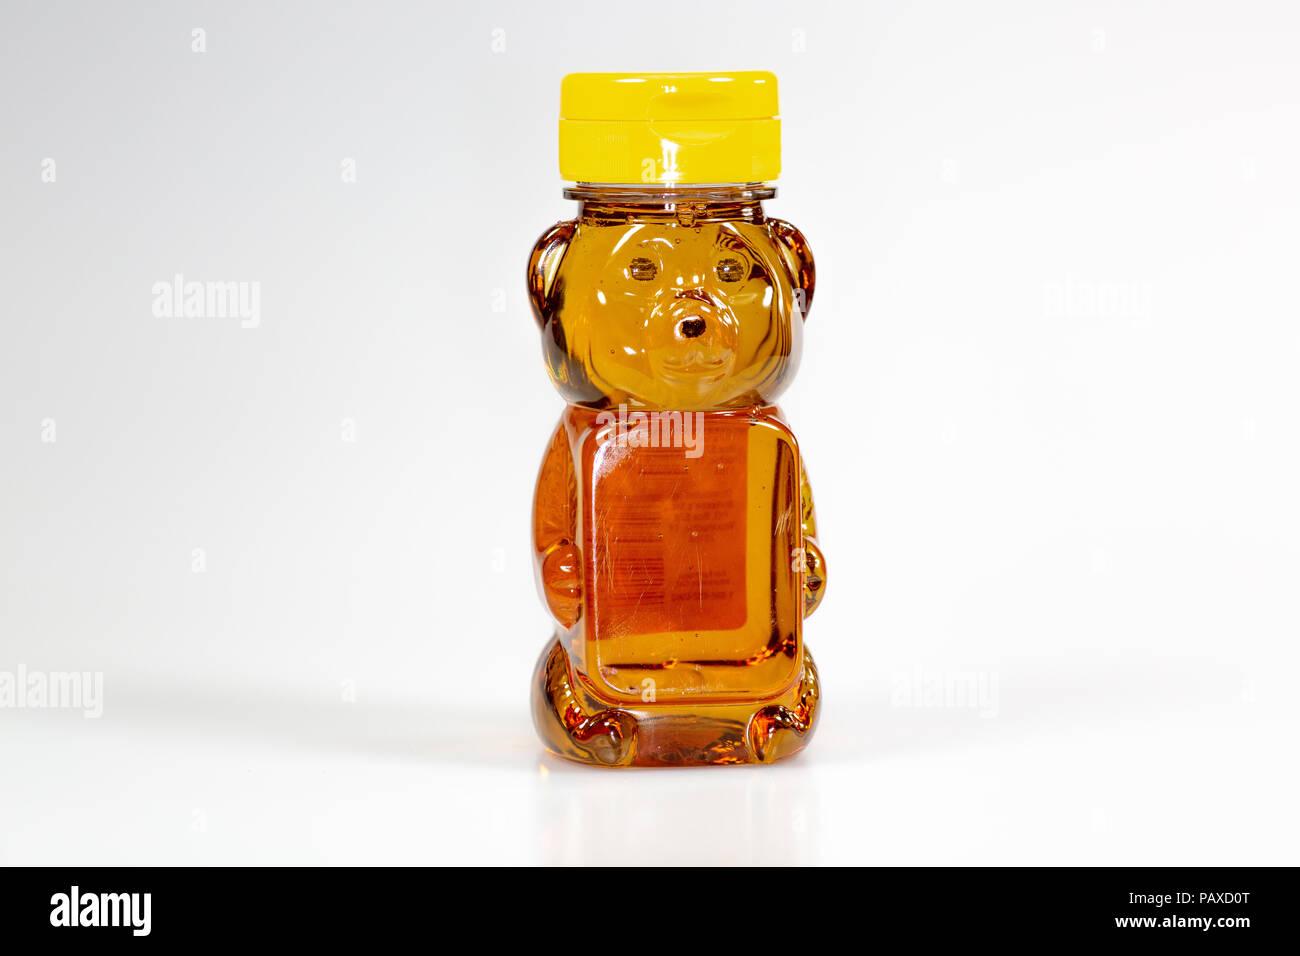 A bear shaped plastic bottle full of honey waiting to be used - Stock Image